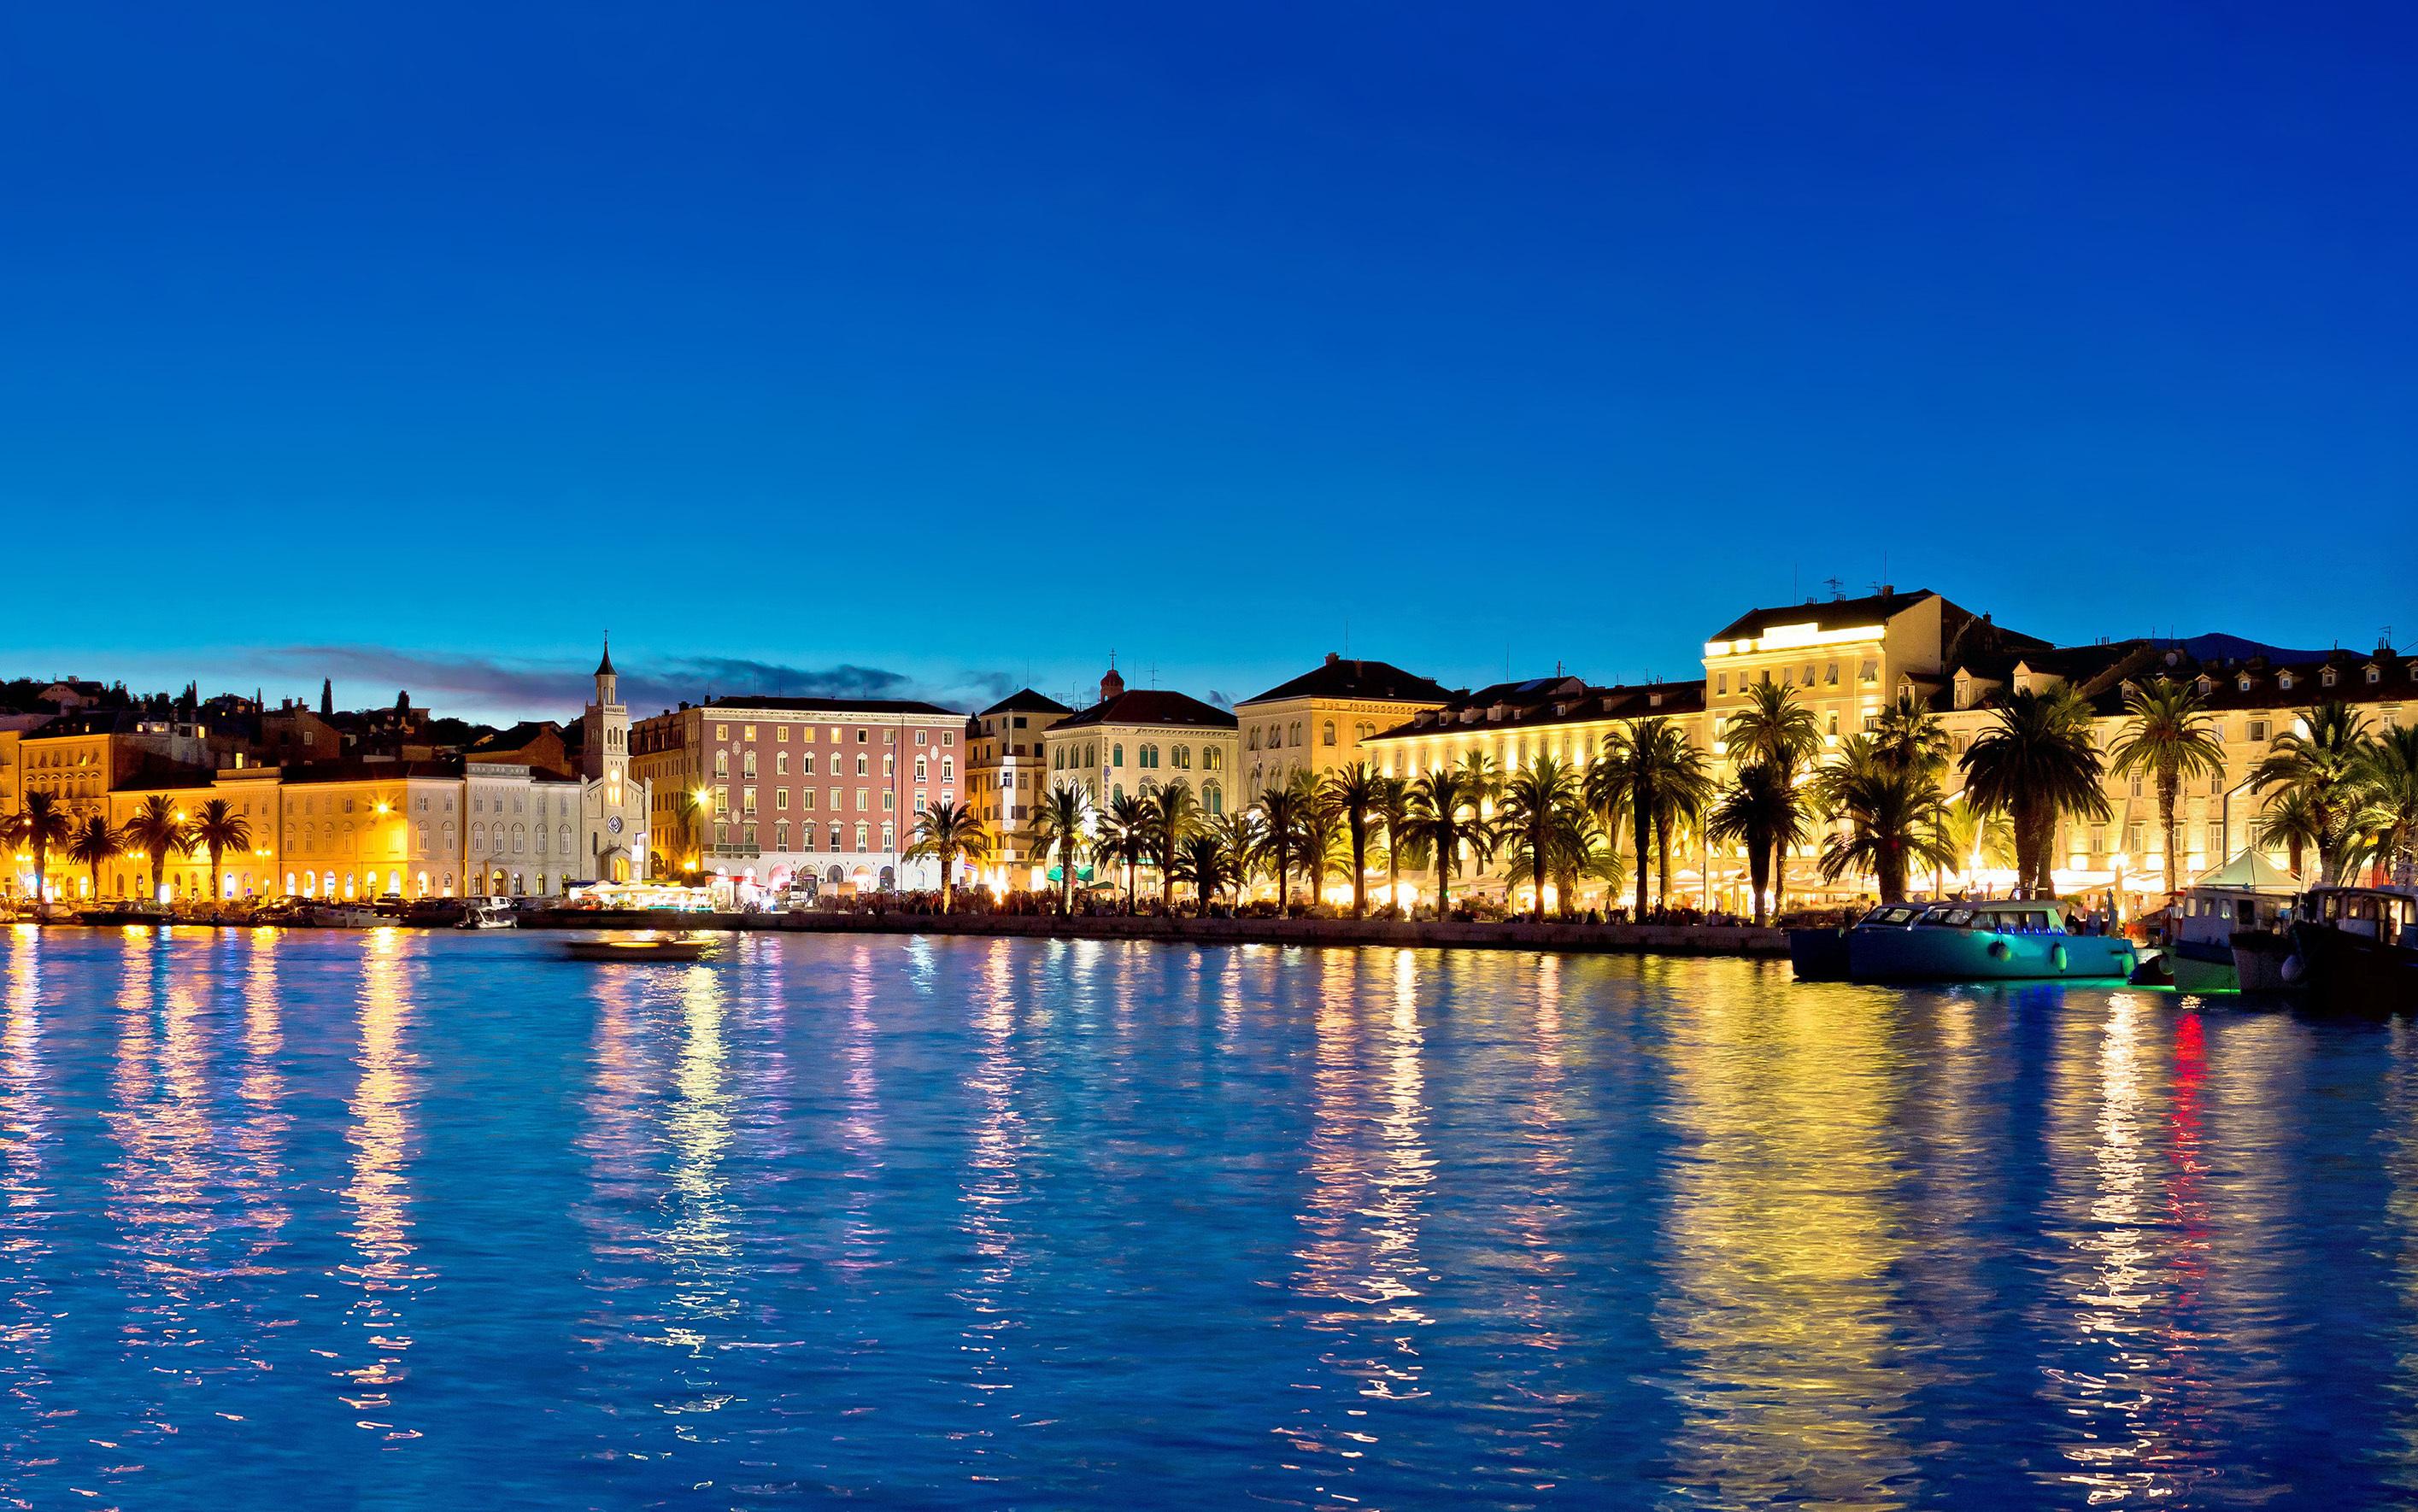 Un paseo por La Riva, el paseo marítimo de Split - Croacia Circuito Gran tour de Croacia e Istria